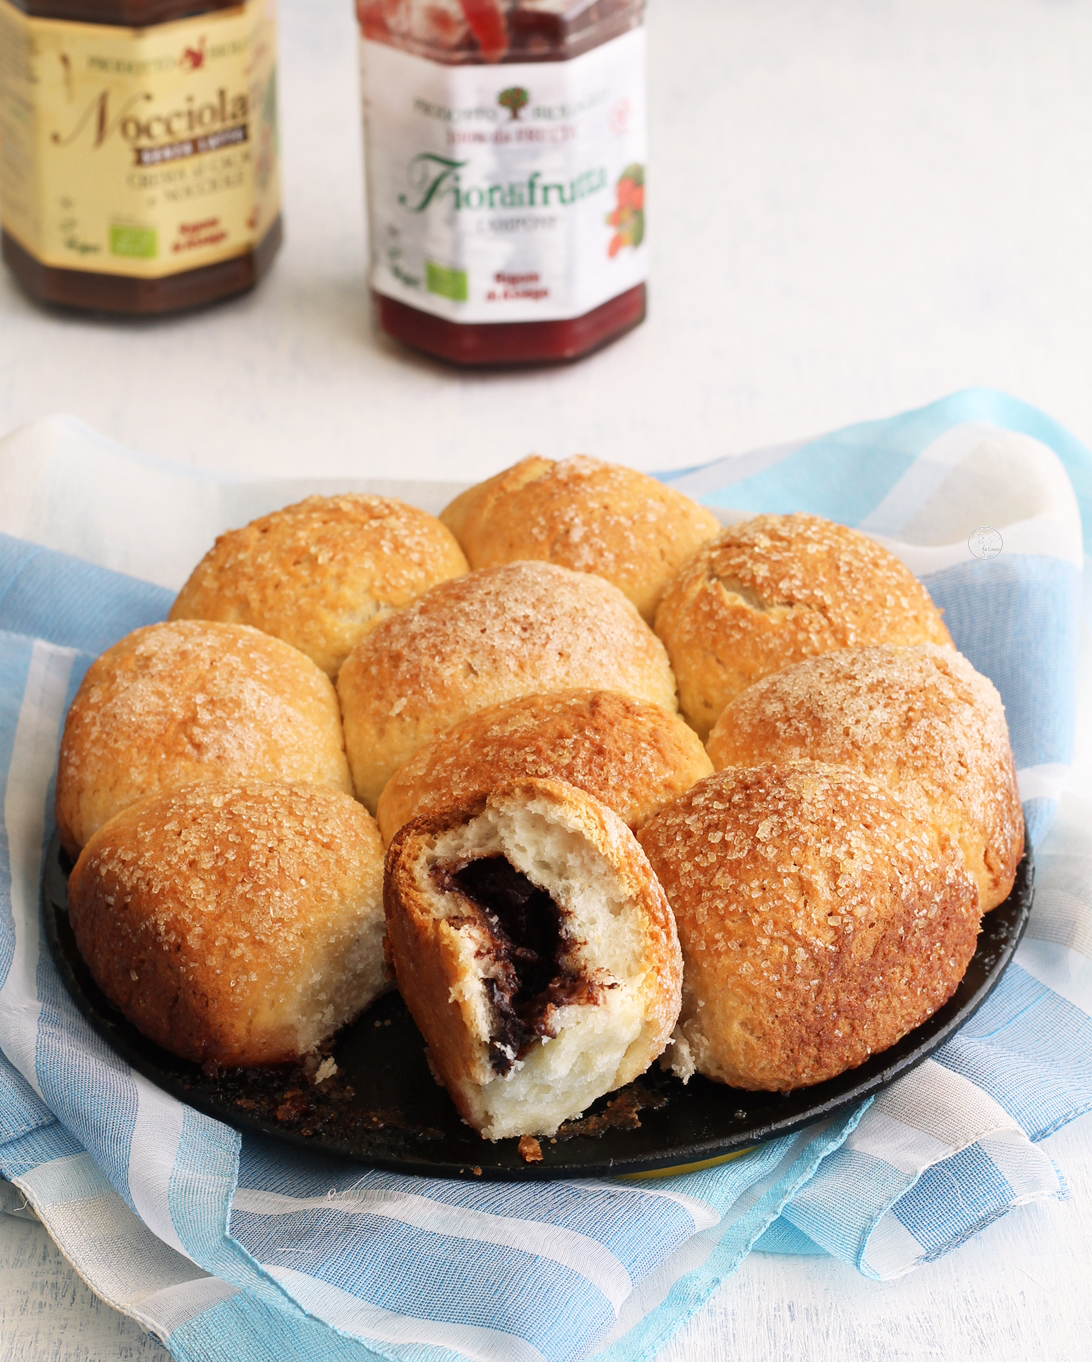 Danubio dolce bigusto senza glutine - La Cassata Celiaca